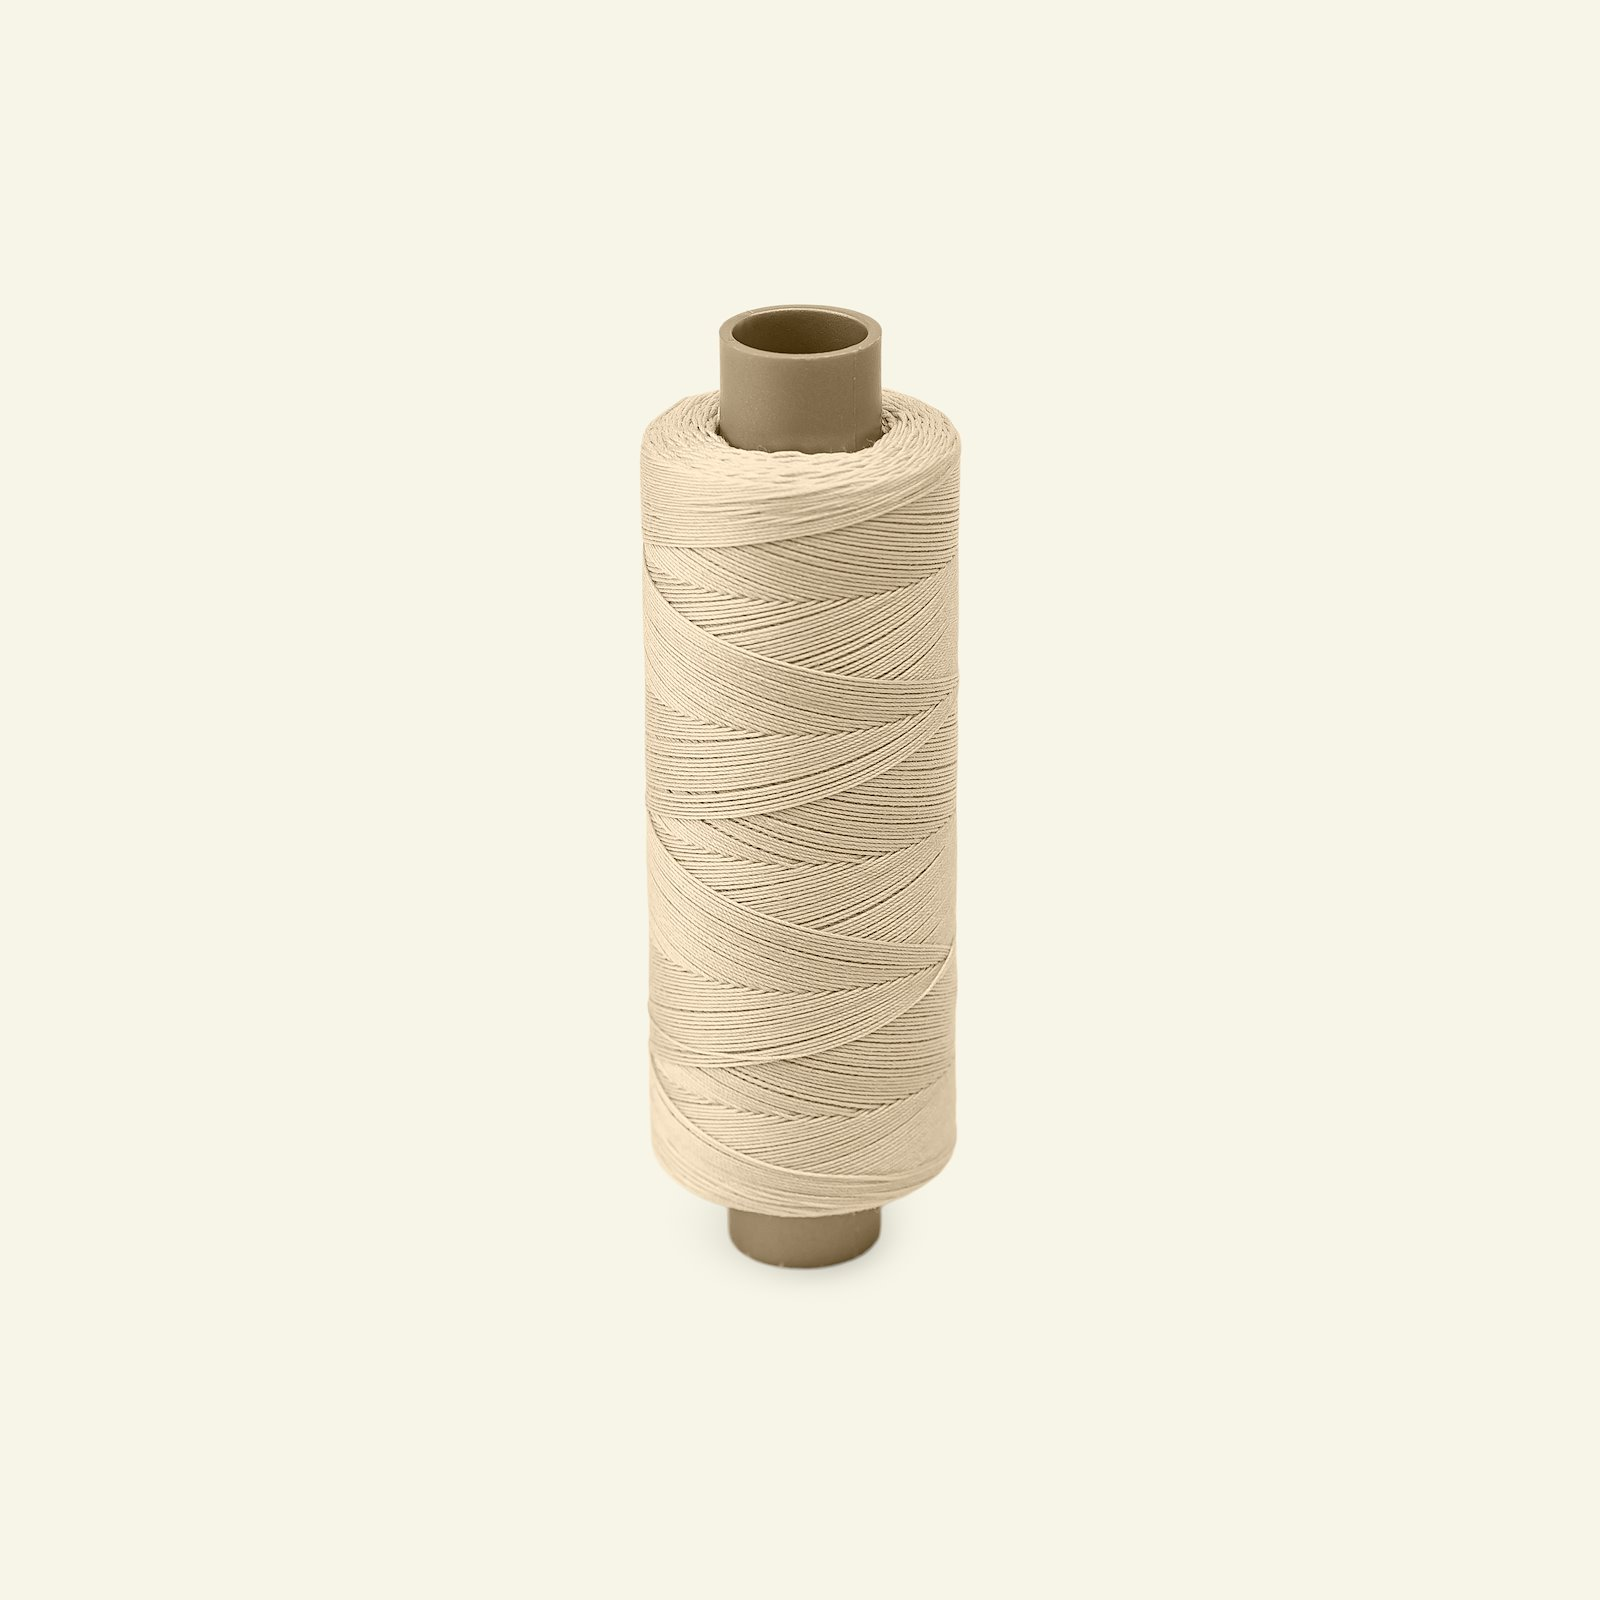 Quilting thread light sand 300m 19038_pack